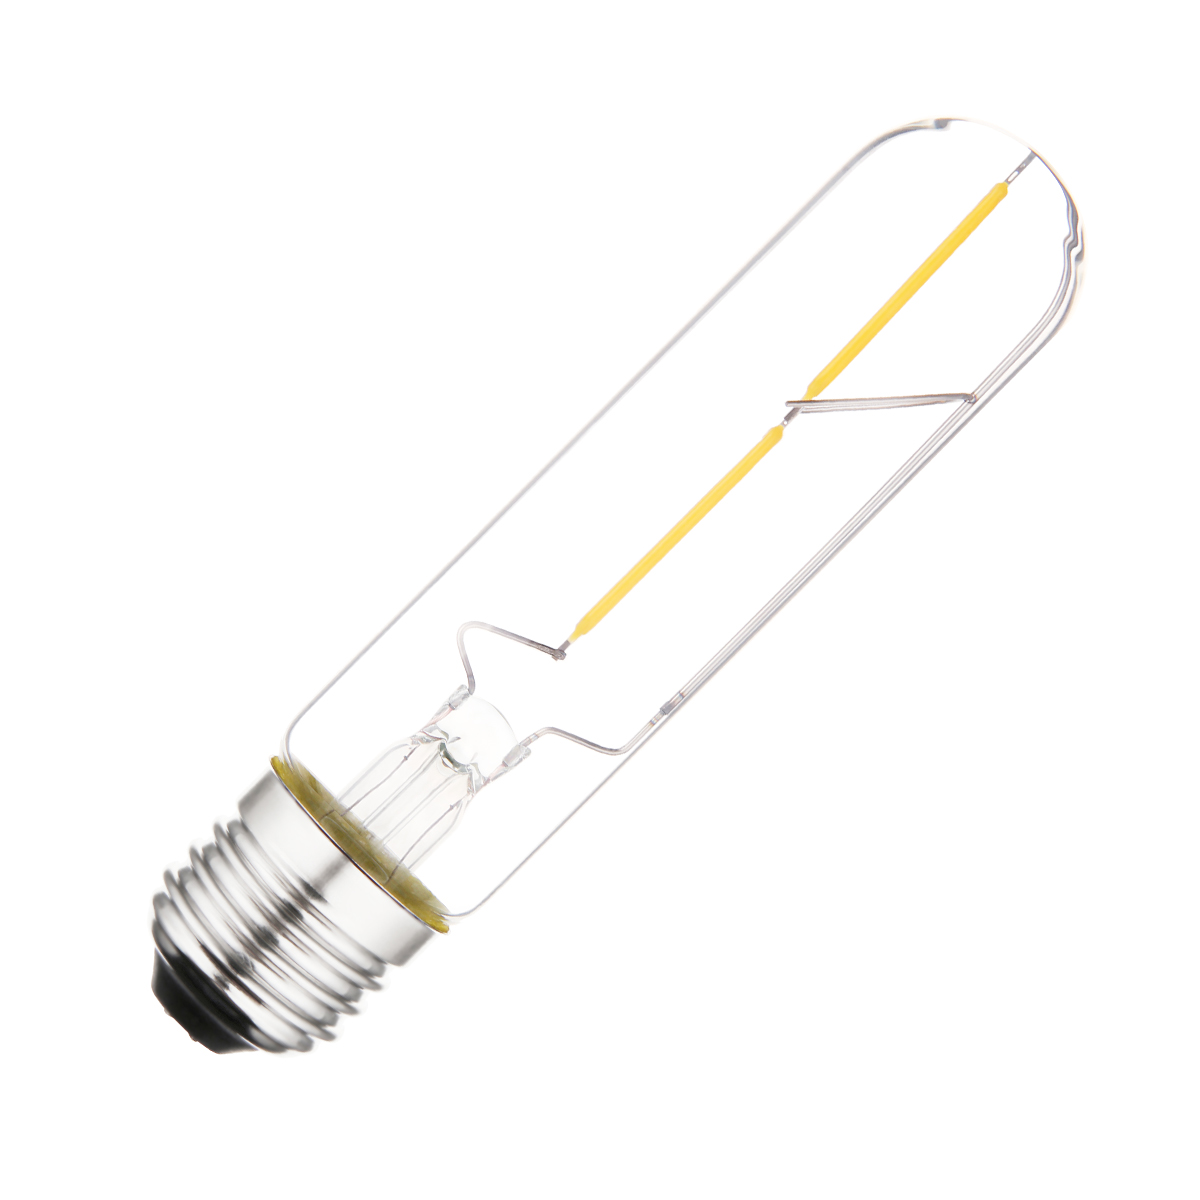 T10 Led Light Bulbs